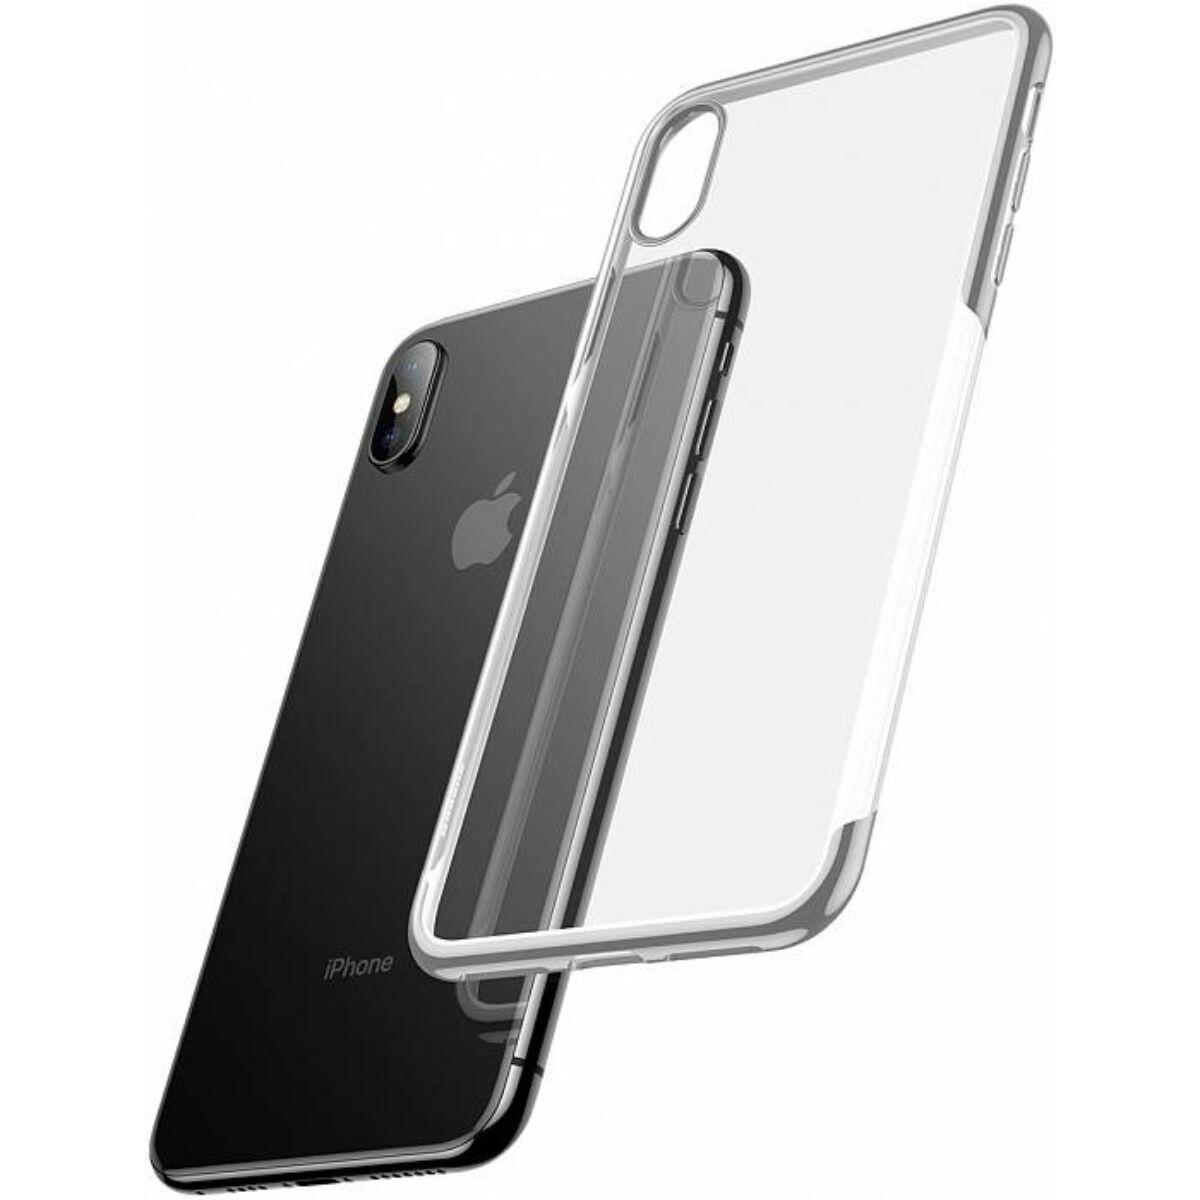 Baseus iPhone X/XS tok, Shining, ezüst (ARAPIPHX-MD0S)